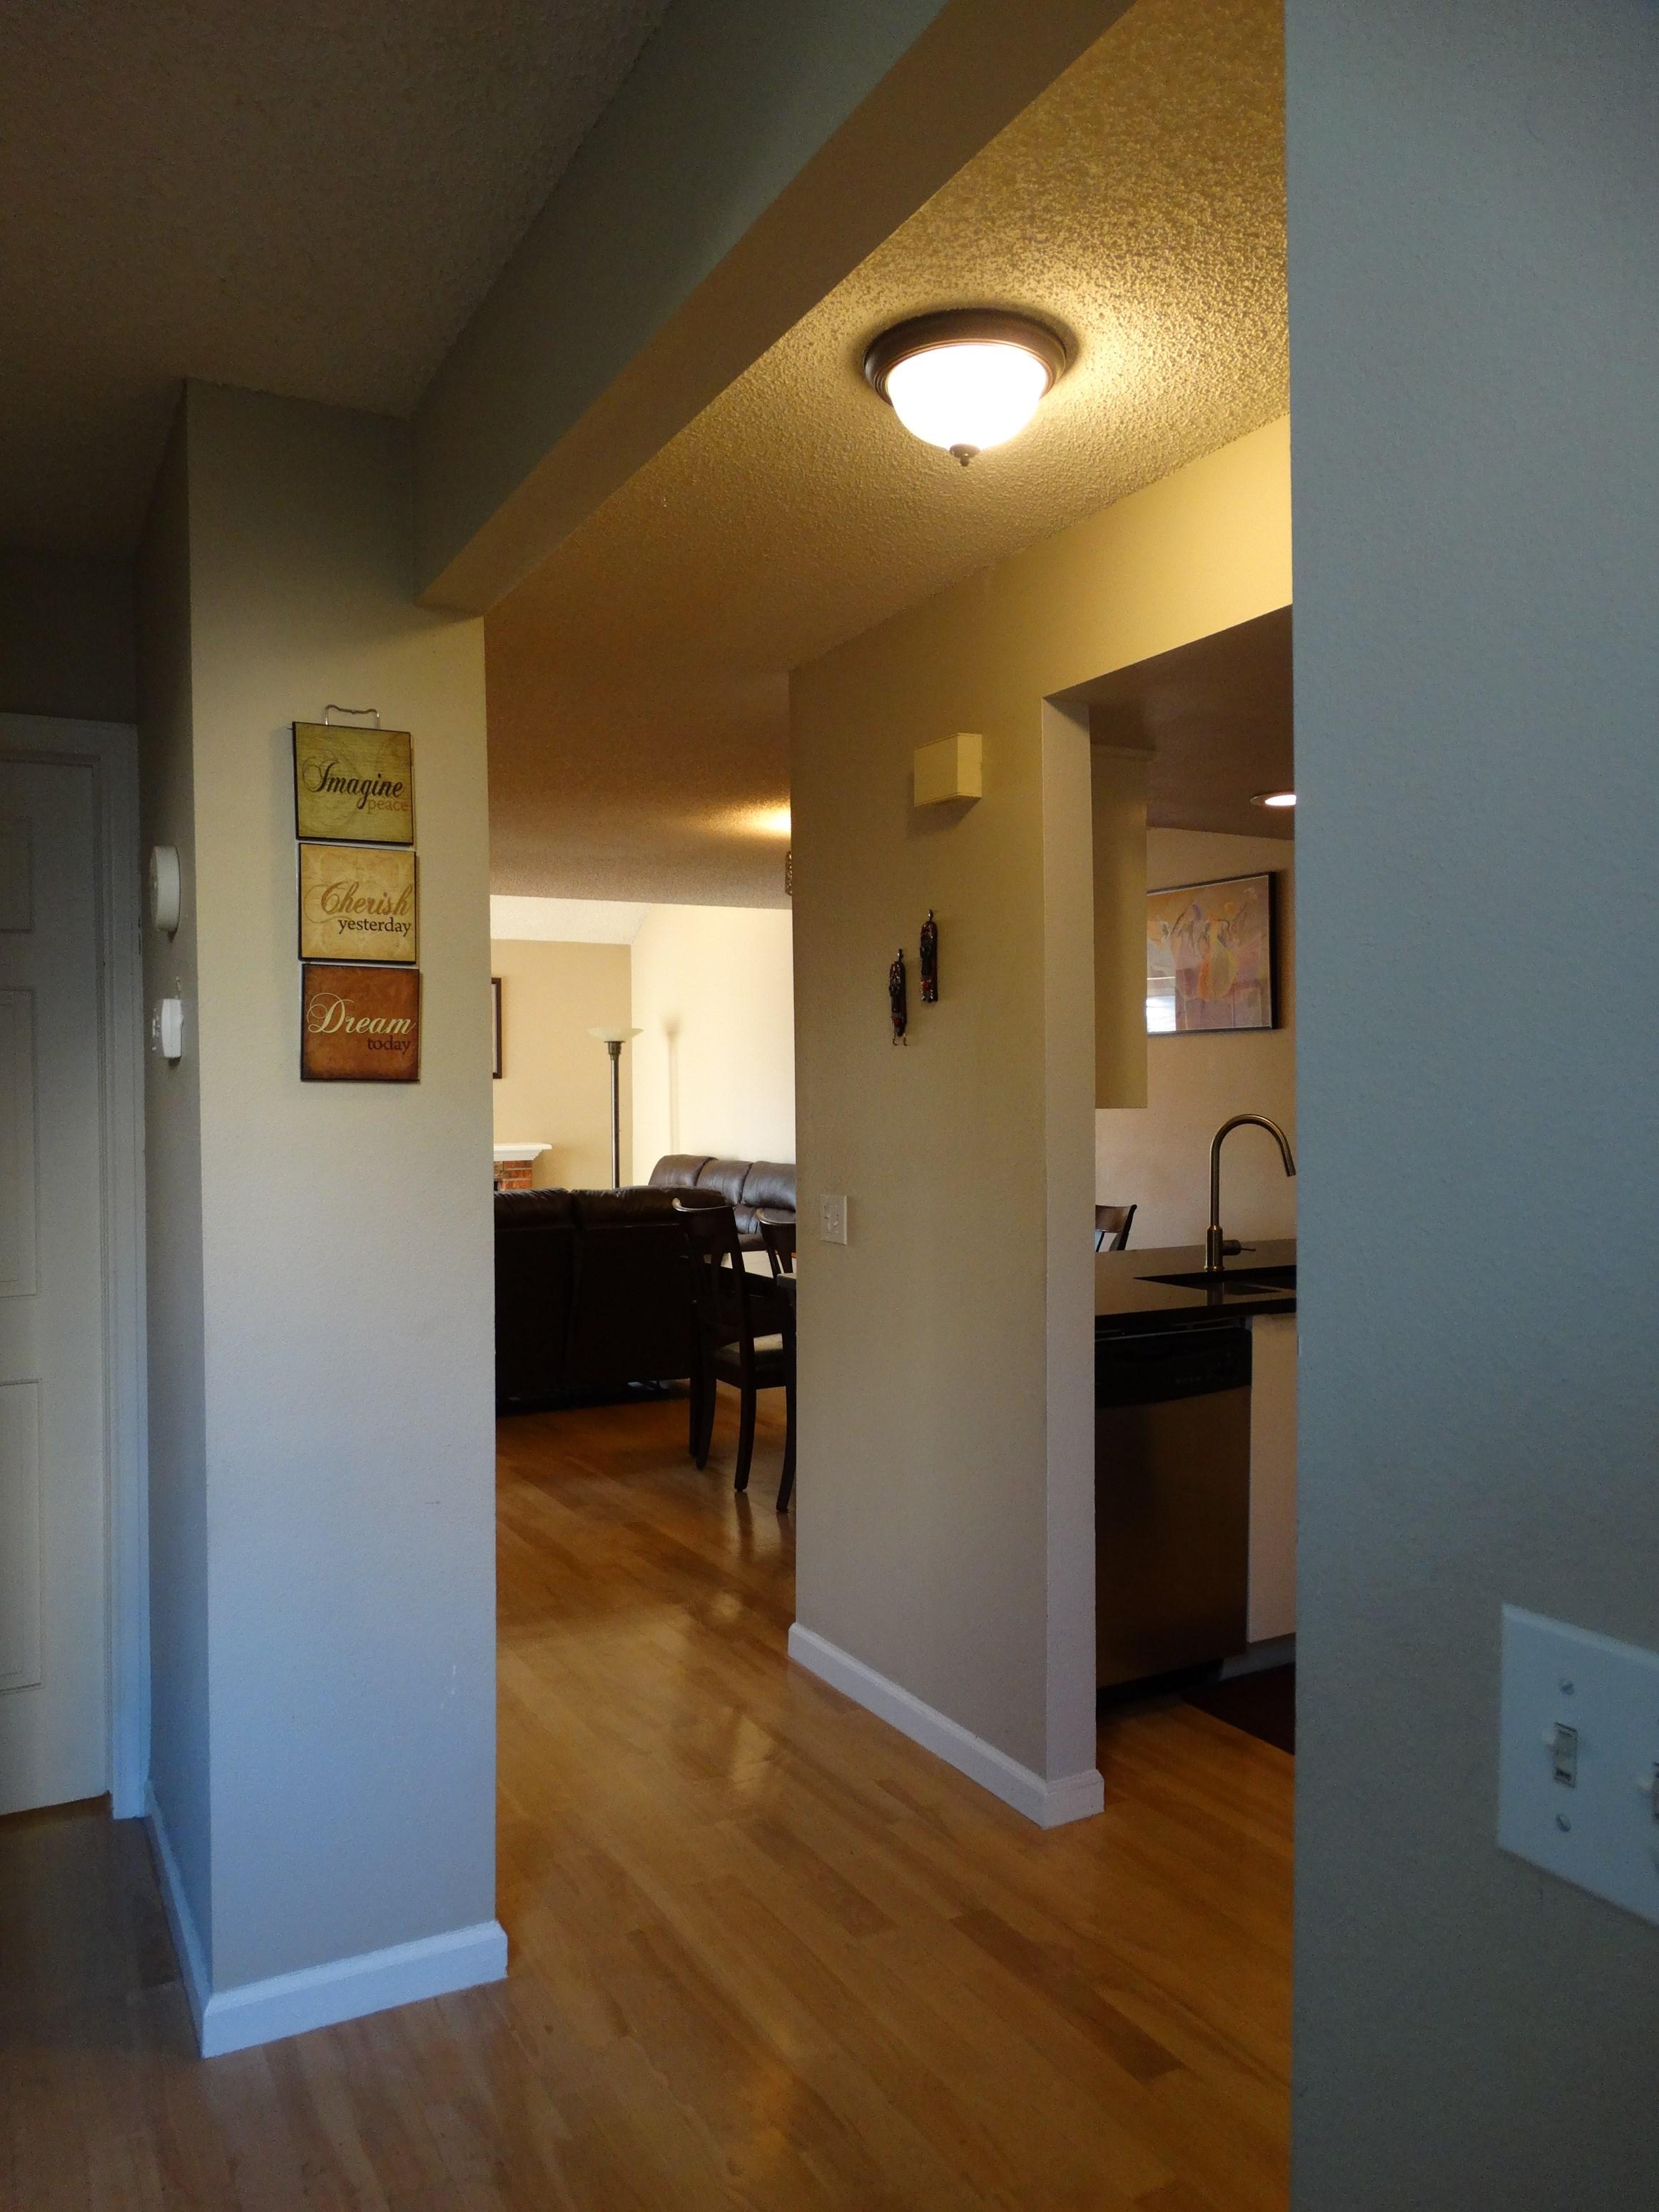 ... 3 Bedroom Apartments Denver Metro Area. 100 1 Bedroom Apartments  Minneapolis Prague Serviced Rooms For Rent Denver Co U2013 Apartments House  Commercial ...